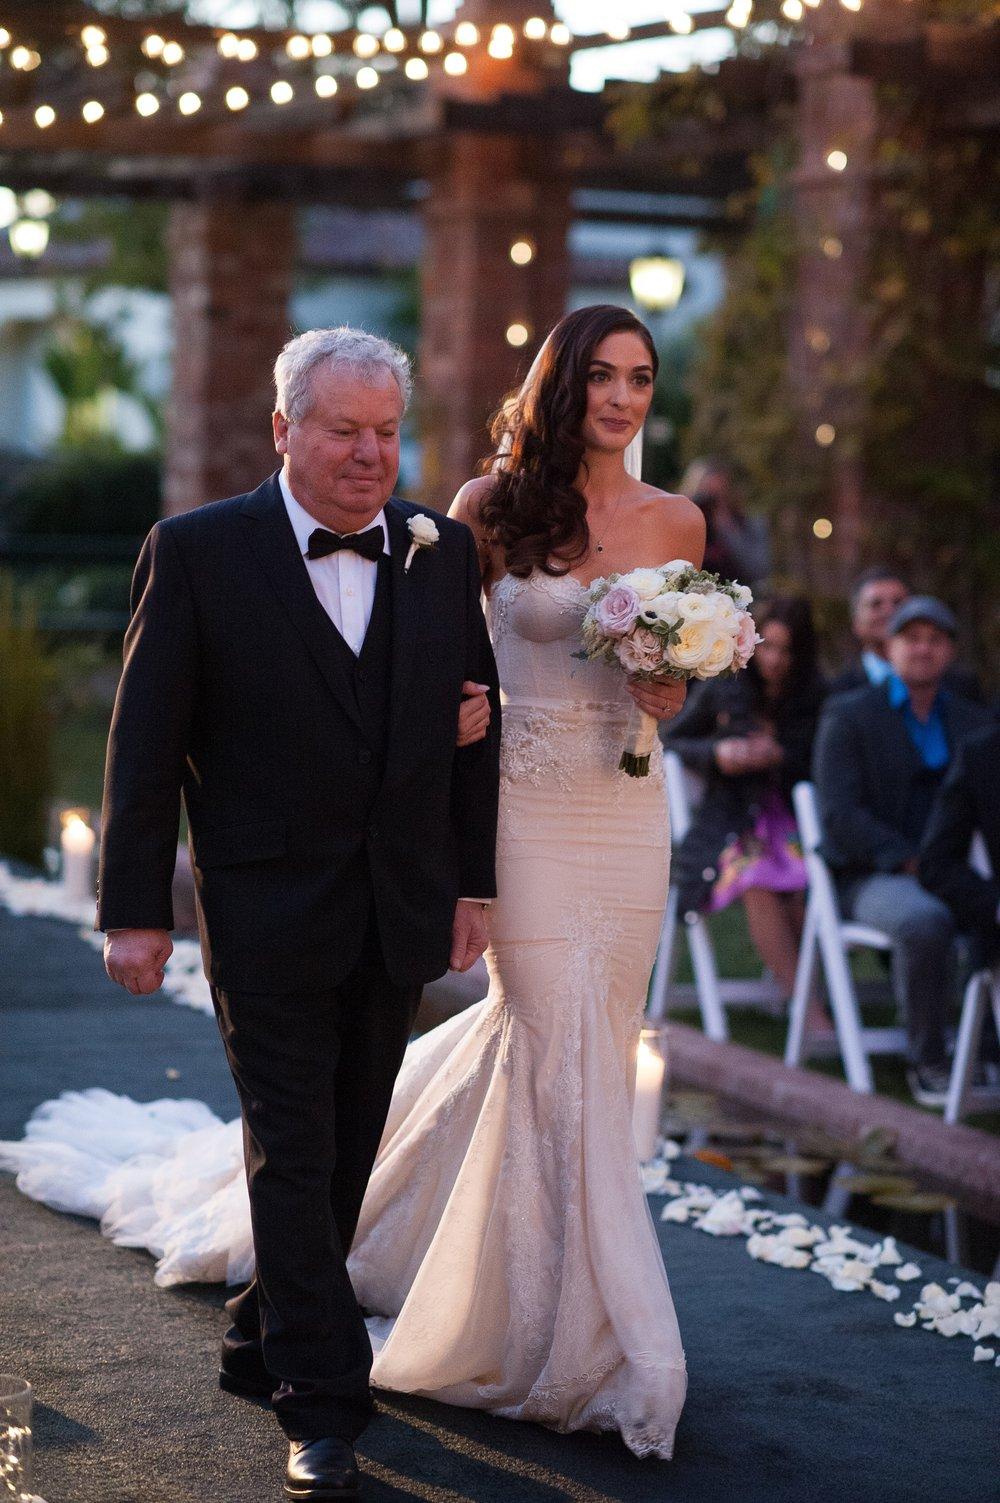 www.santabarbaraweddingstyle.com | Santa Barbara Wedding Style | Felici Events | El Encanto Wedding | Nate and Jenny Weddings | Father of the Bride and Bride | Precious and Blooming | Wedding Ceremony